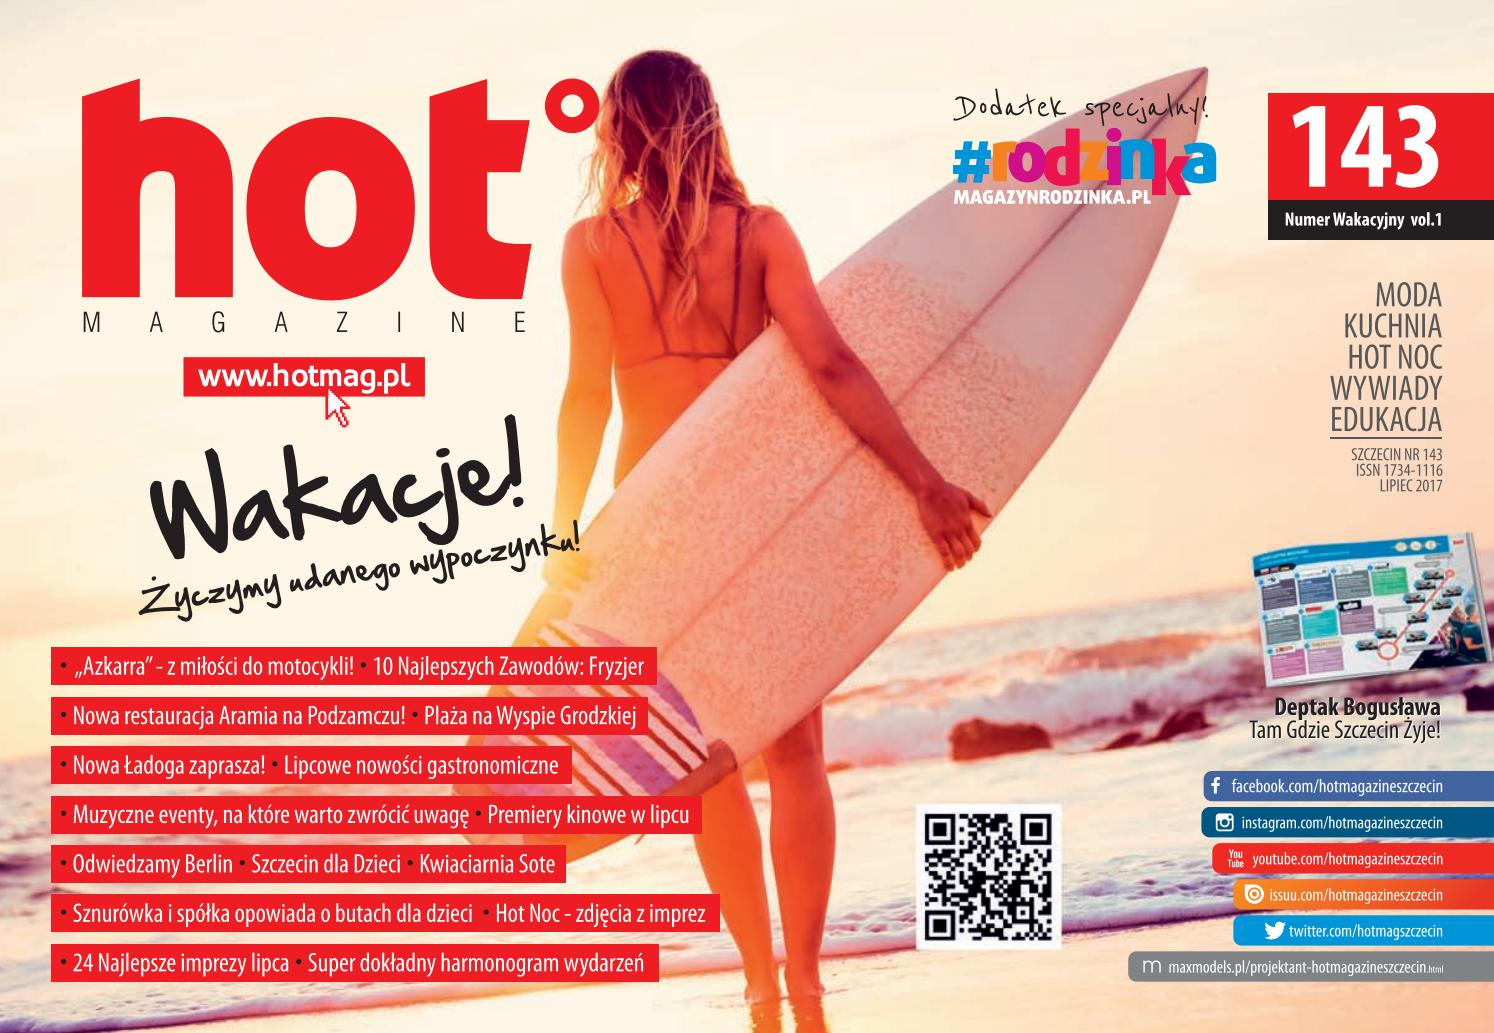 Hotmagazine 143 Szczecin By Hot Magazine Issuu